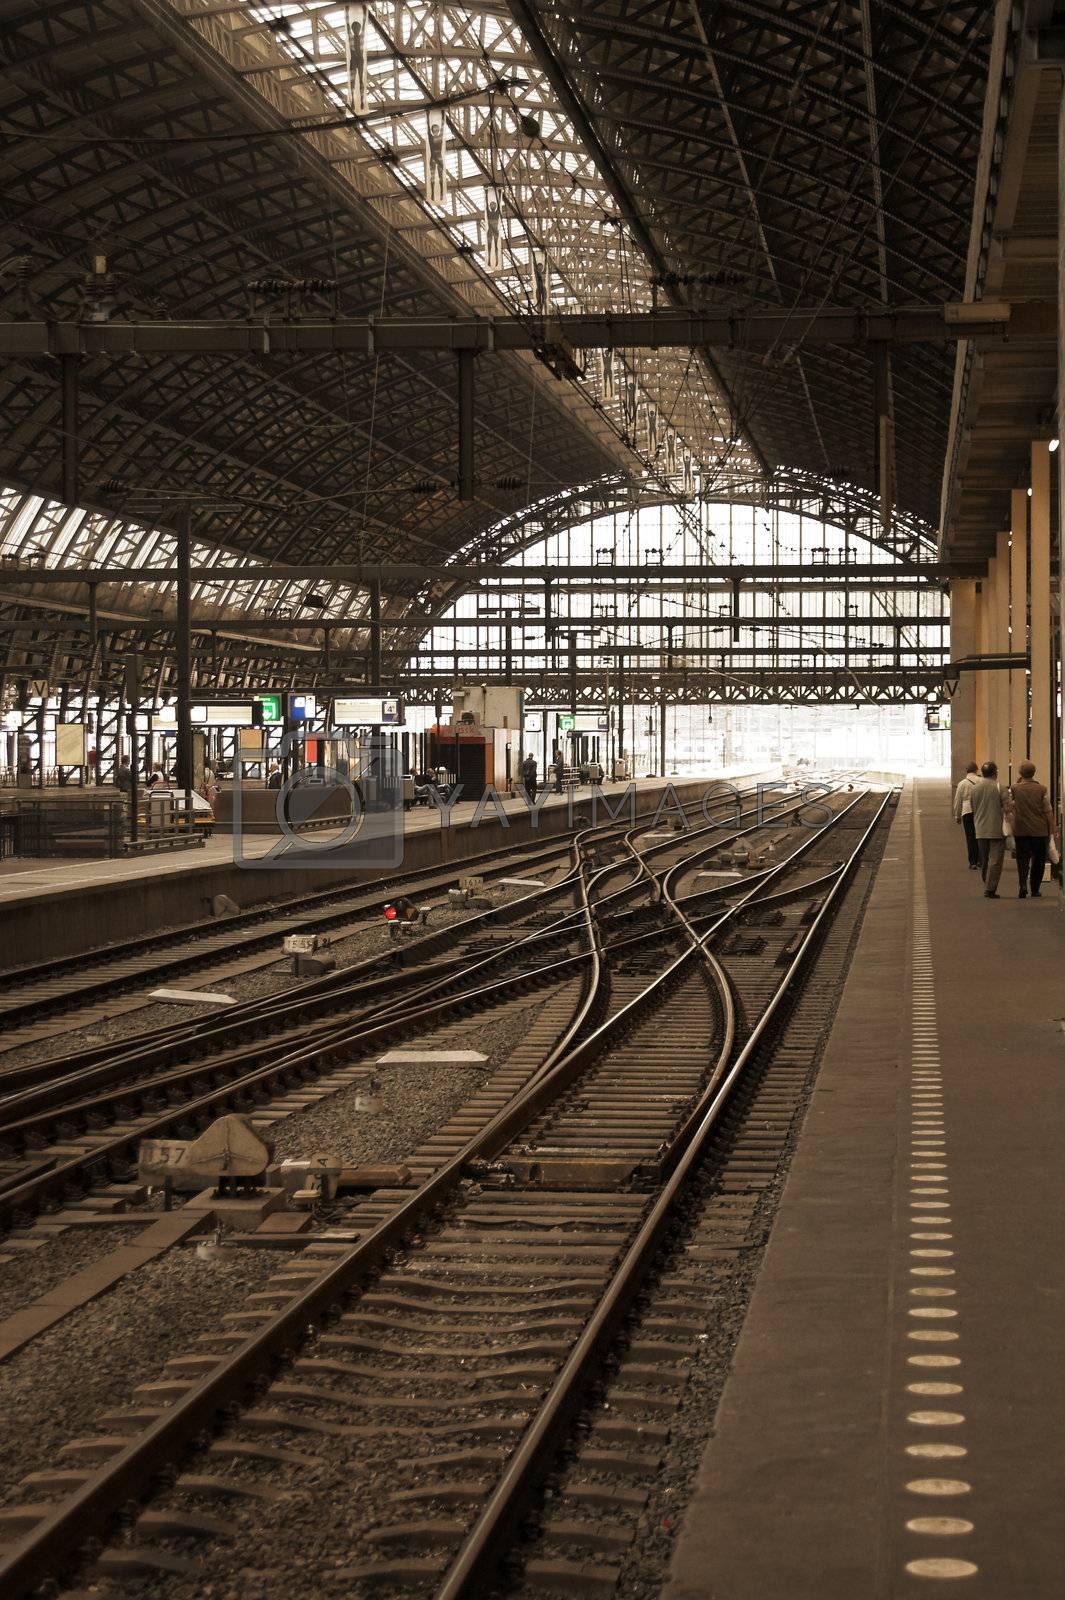 railway station by MikLav